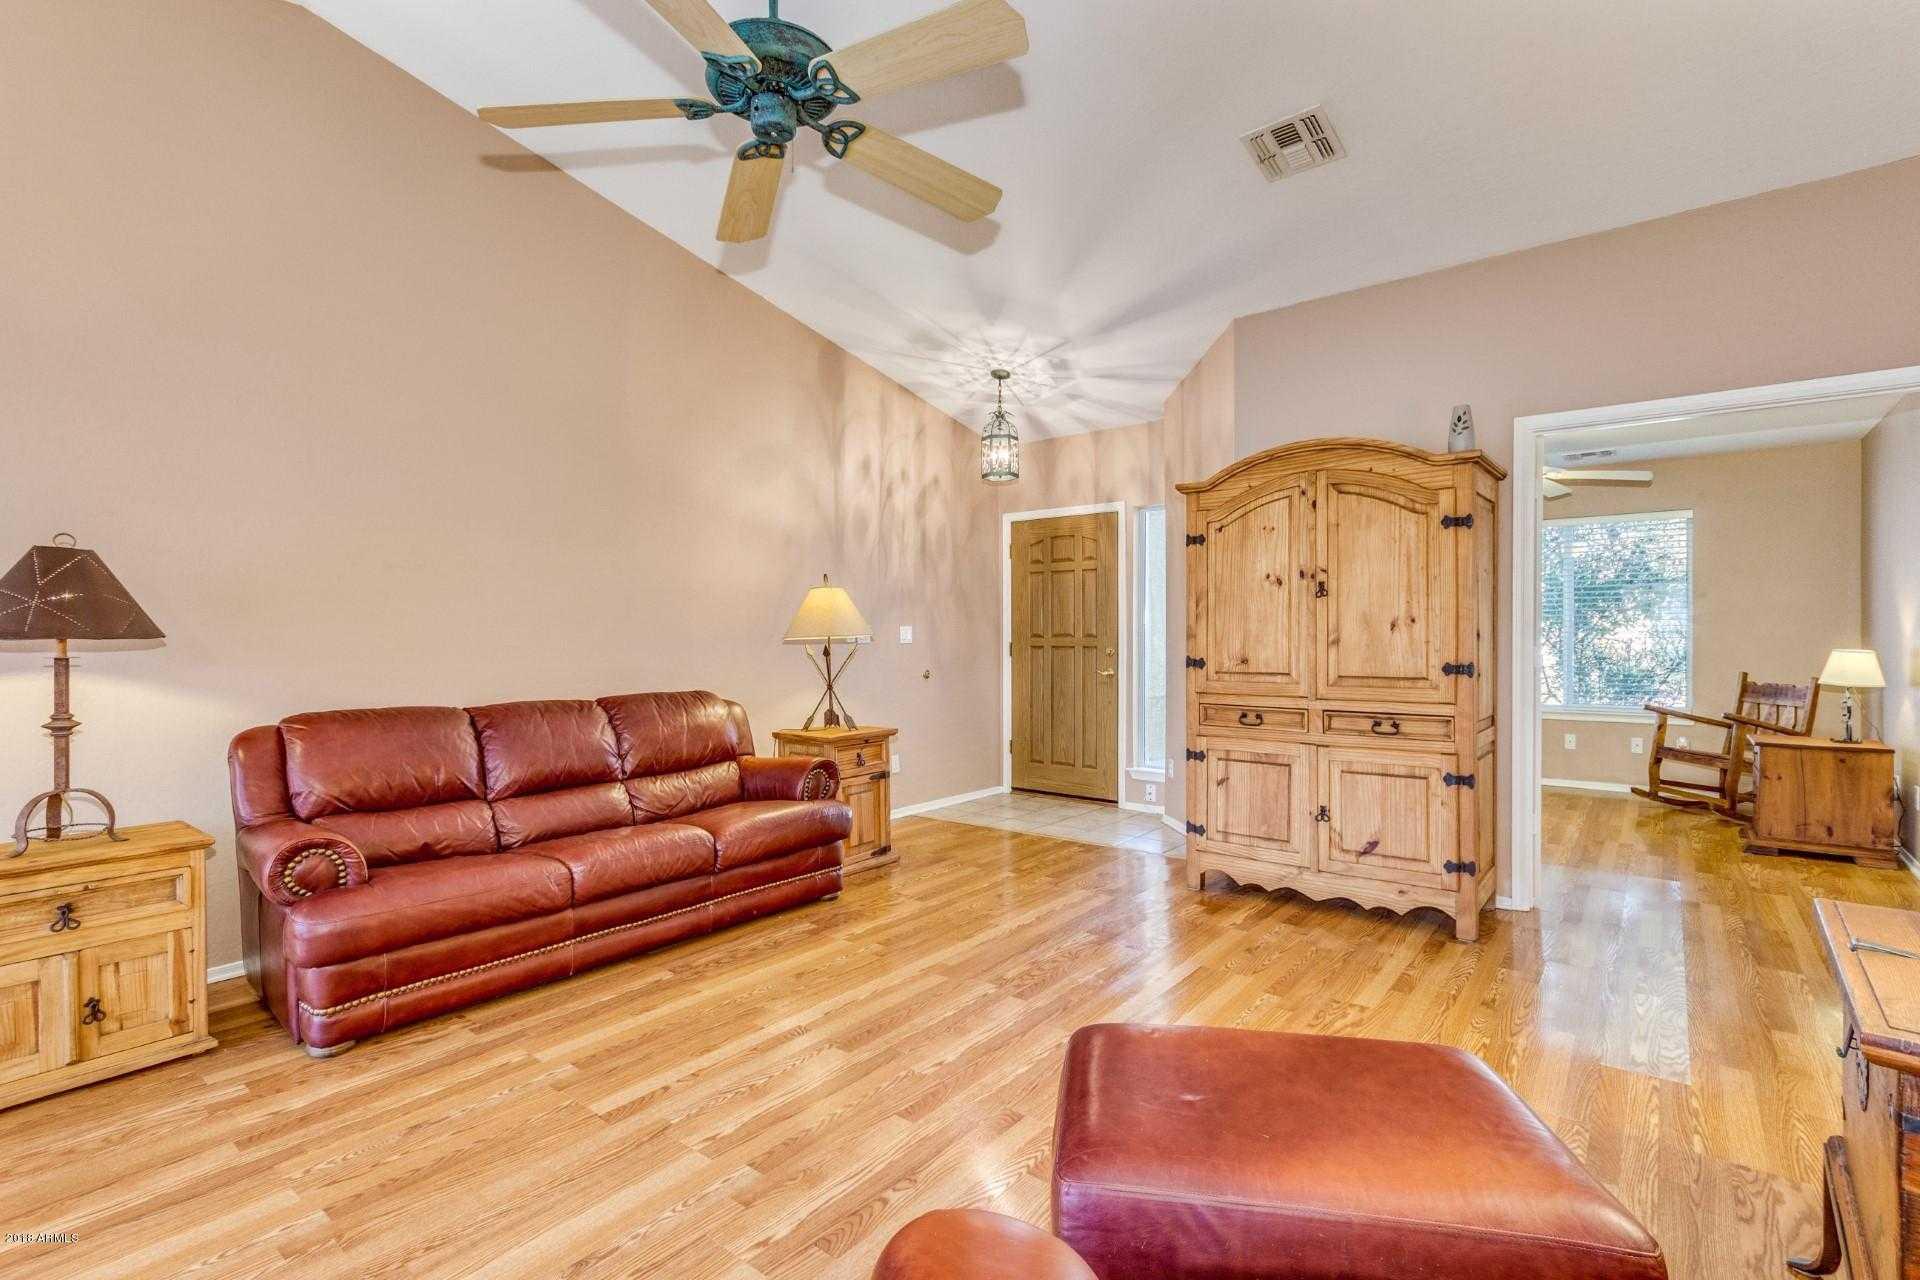 $249,000 - 3Br/2Ba - Home for Sale in Estrella Parcel 56, Goodyear